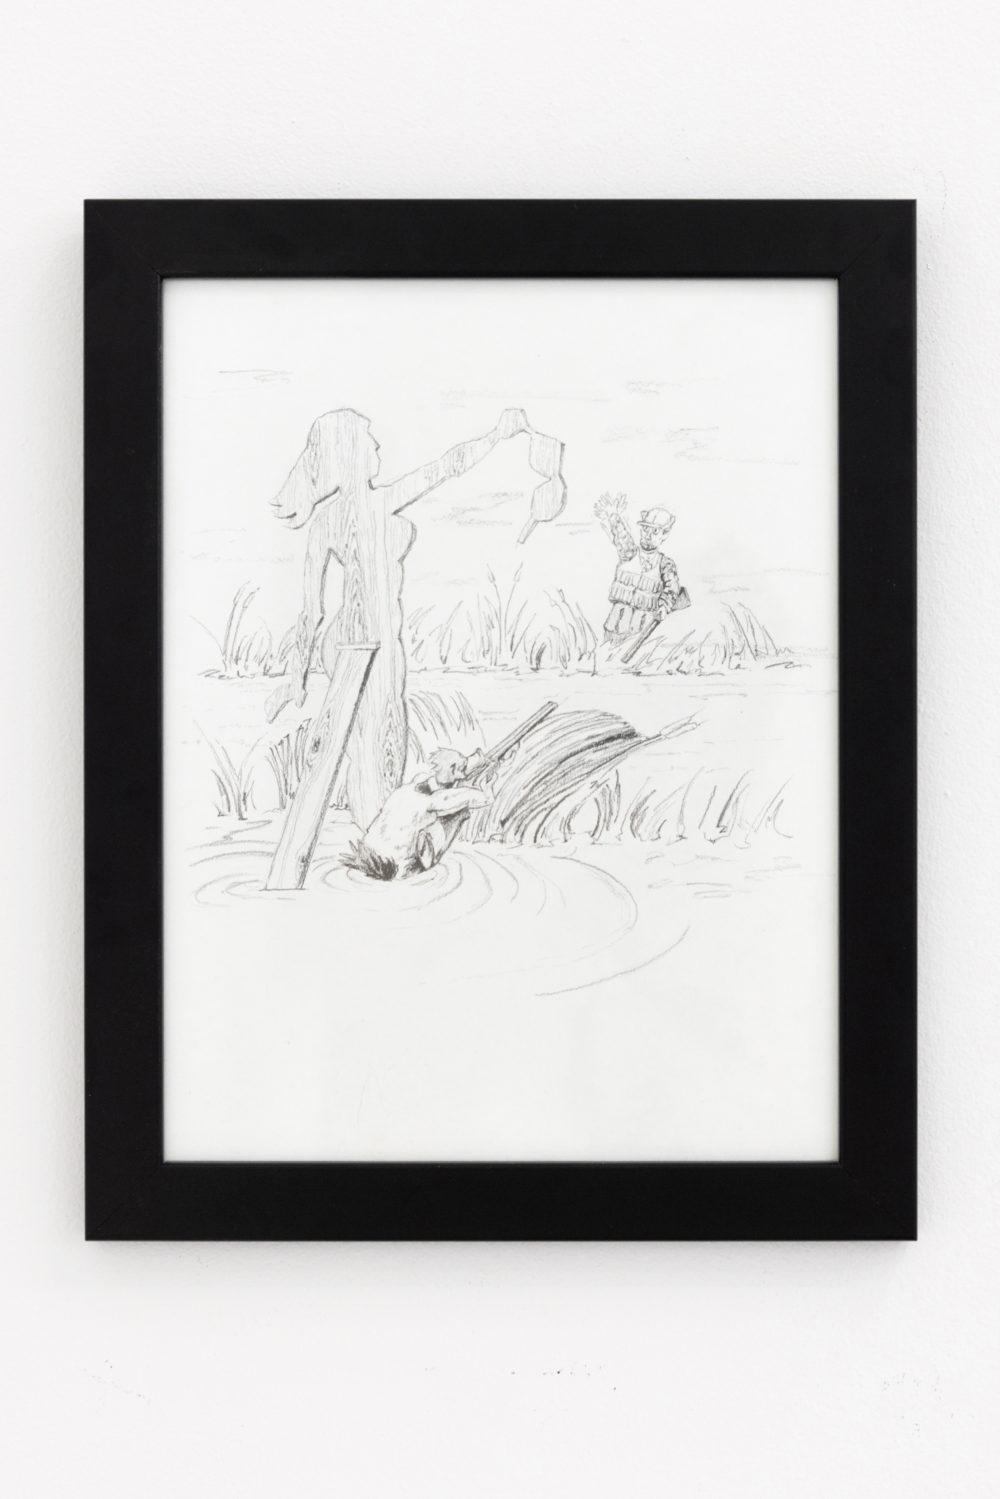 Gunnar Tchida Duck Hunter Shoots Angel, 2016 Graphite on paper